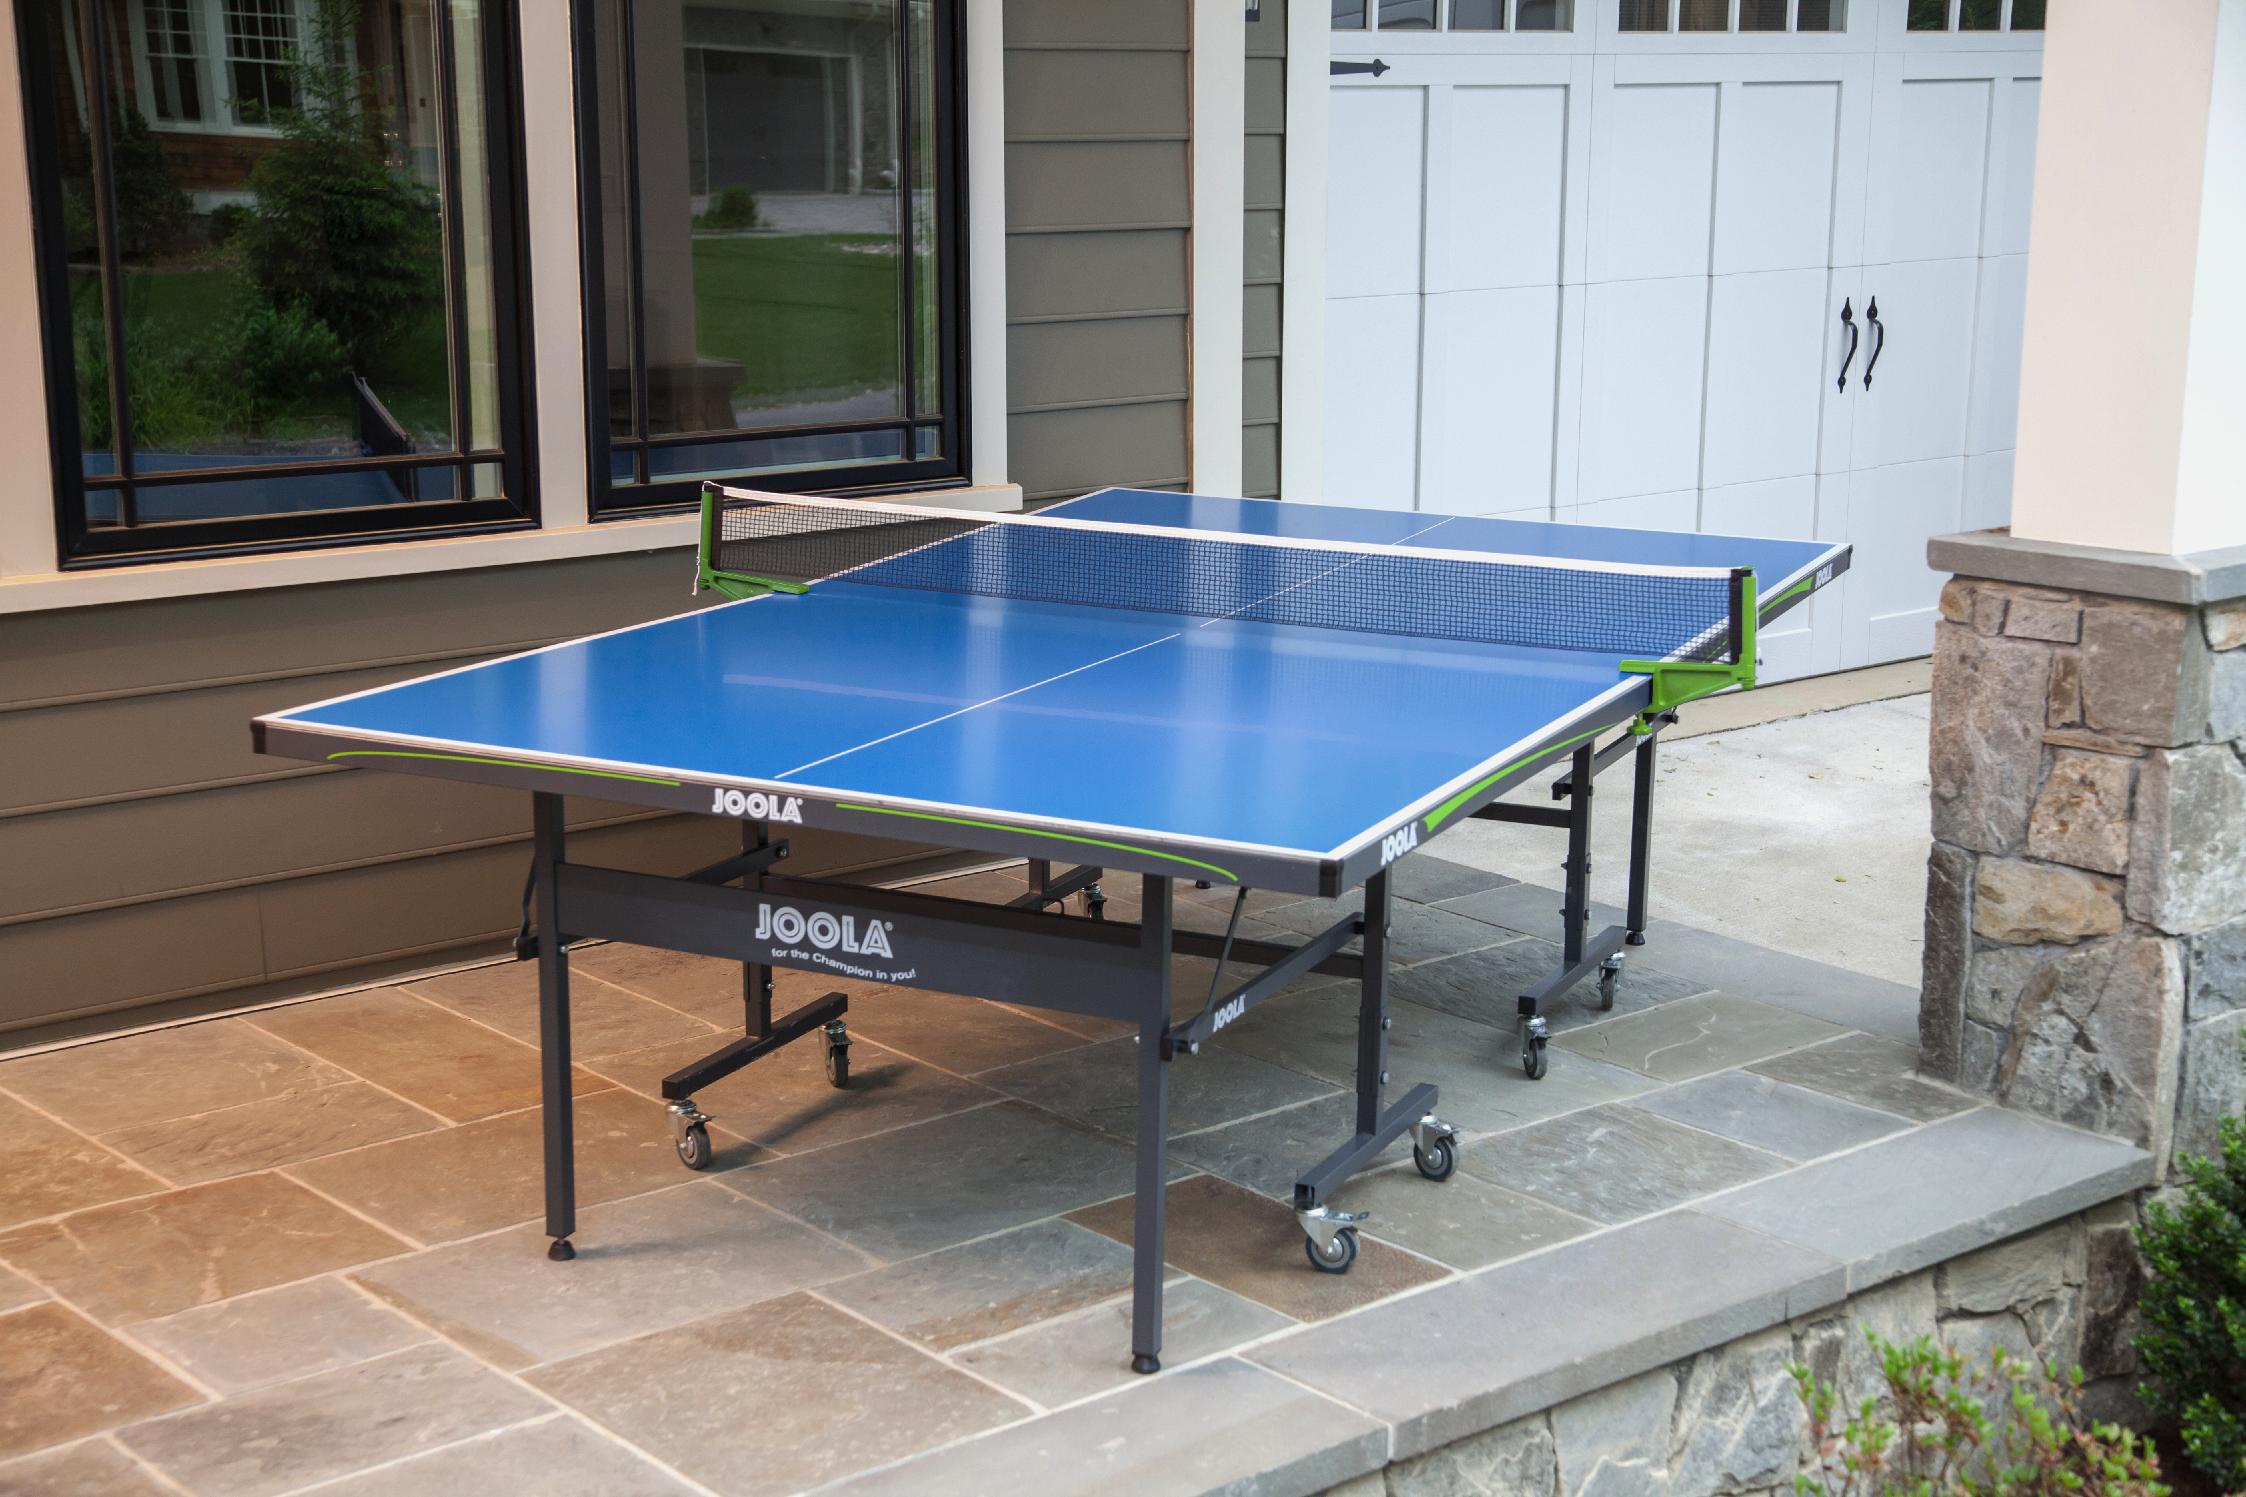 Outdoor Aluminum Table Tennis Table with Weatherproof Net Set